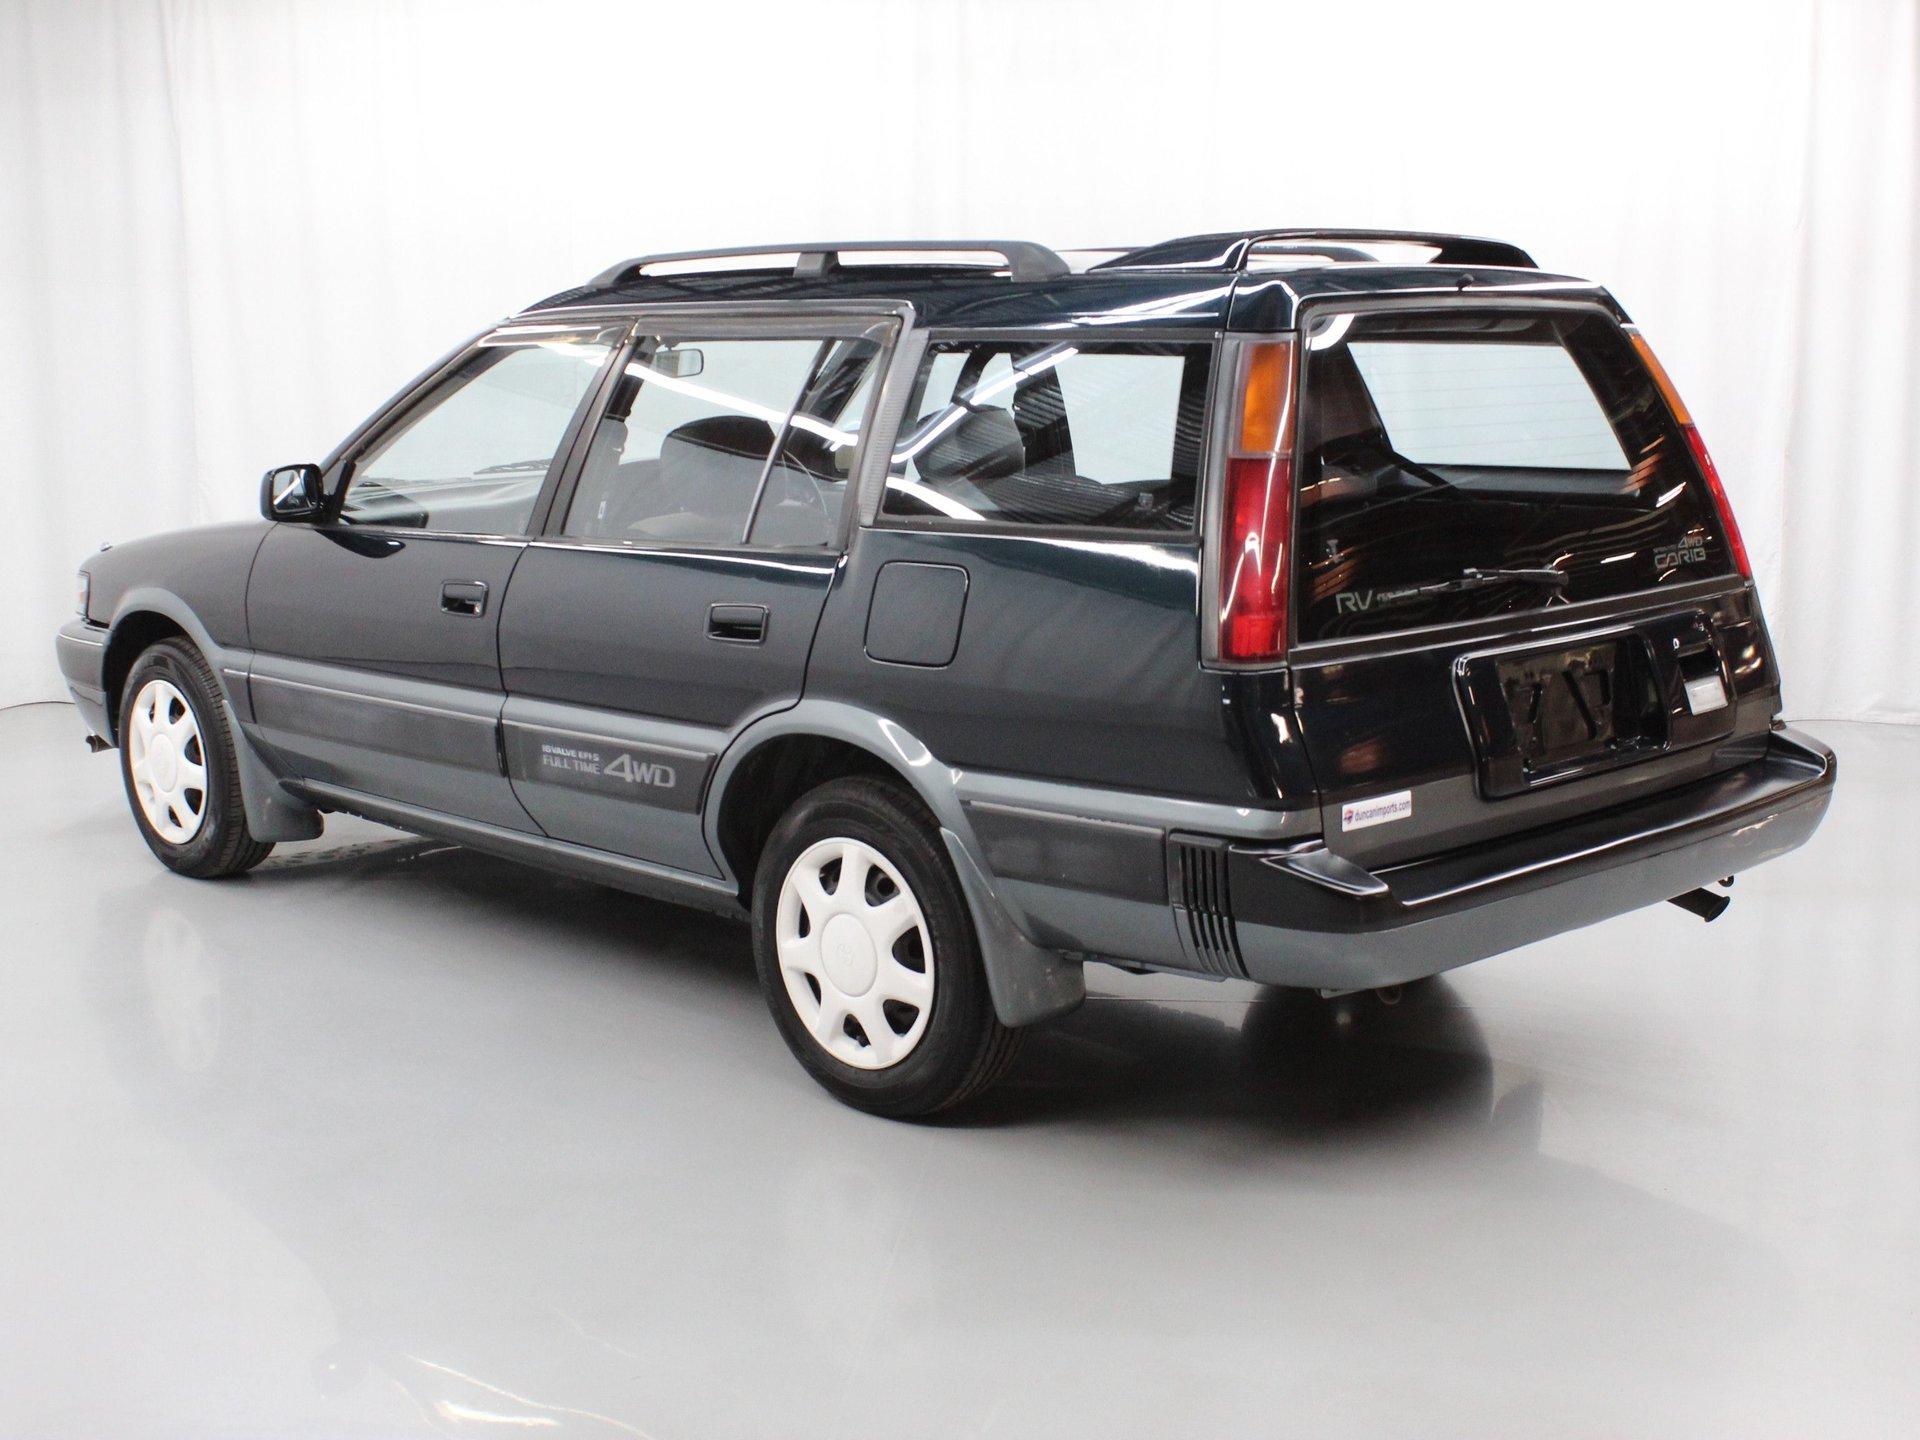 1994 Toyota Sprinter